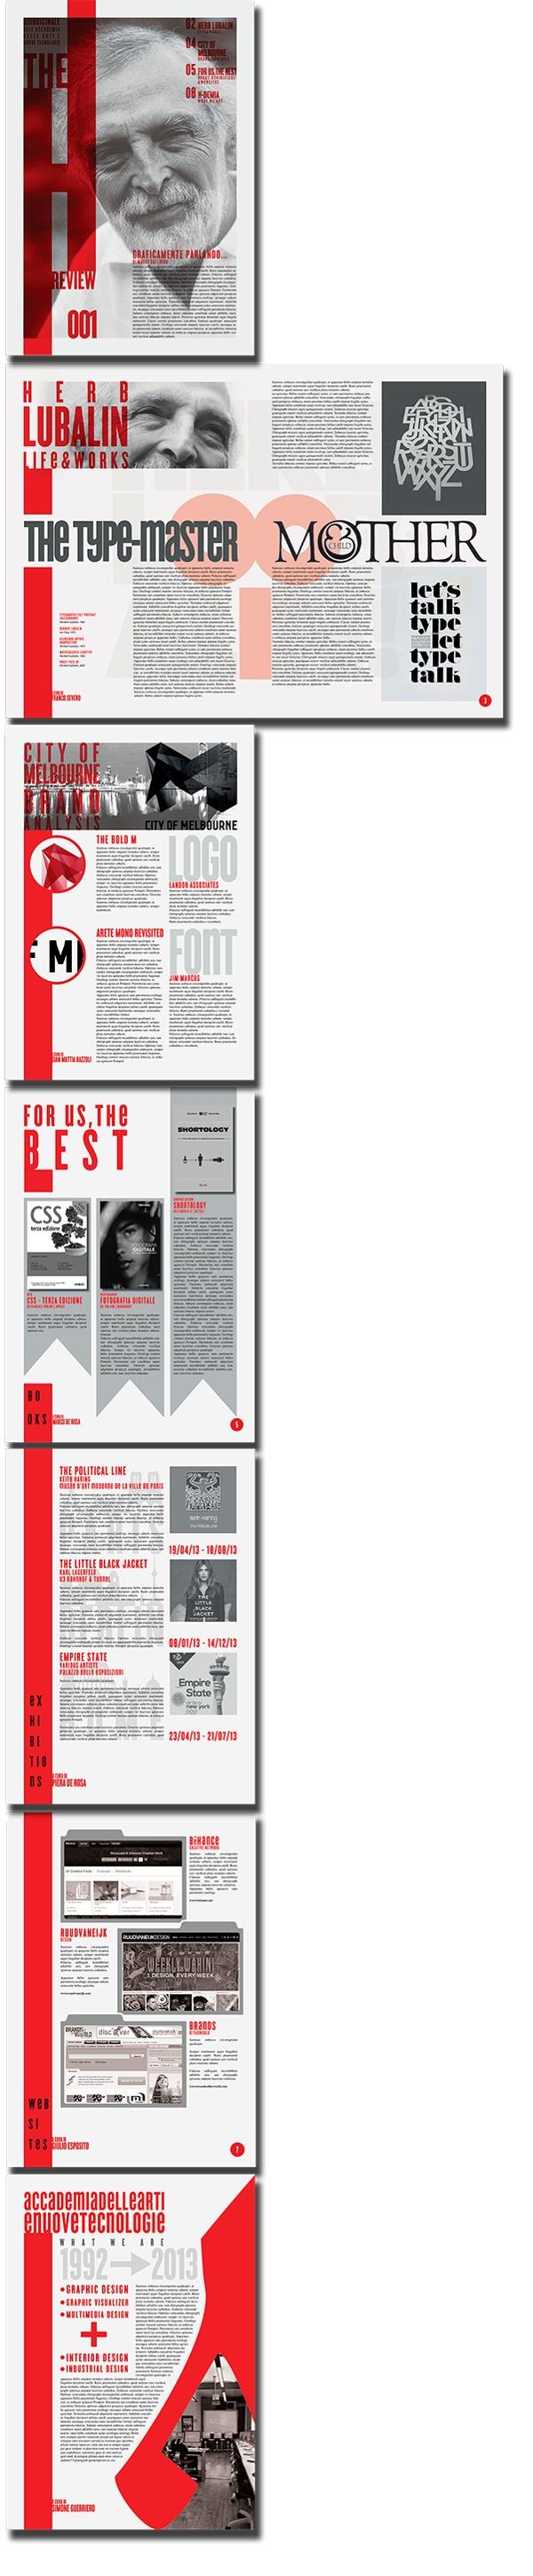 The H Review - Tabloid | Editorial Design | by Eugenio De Riso, via Behance